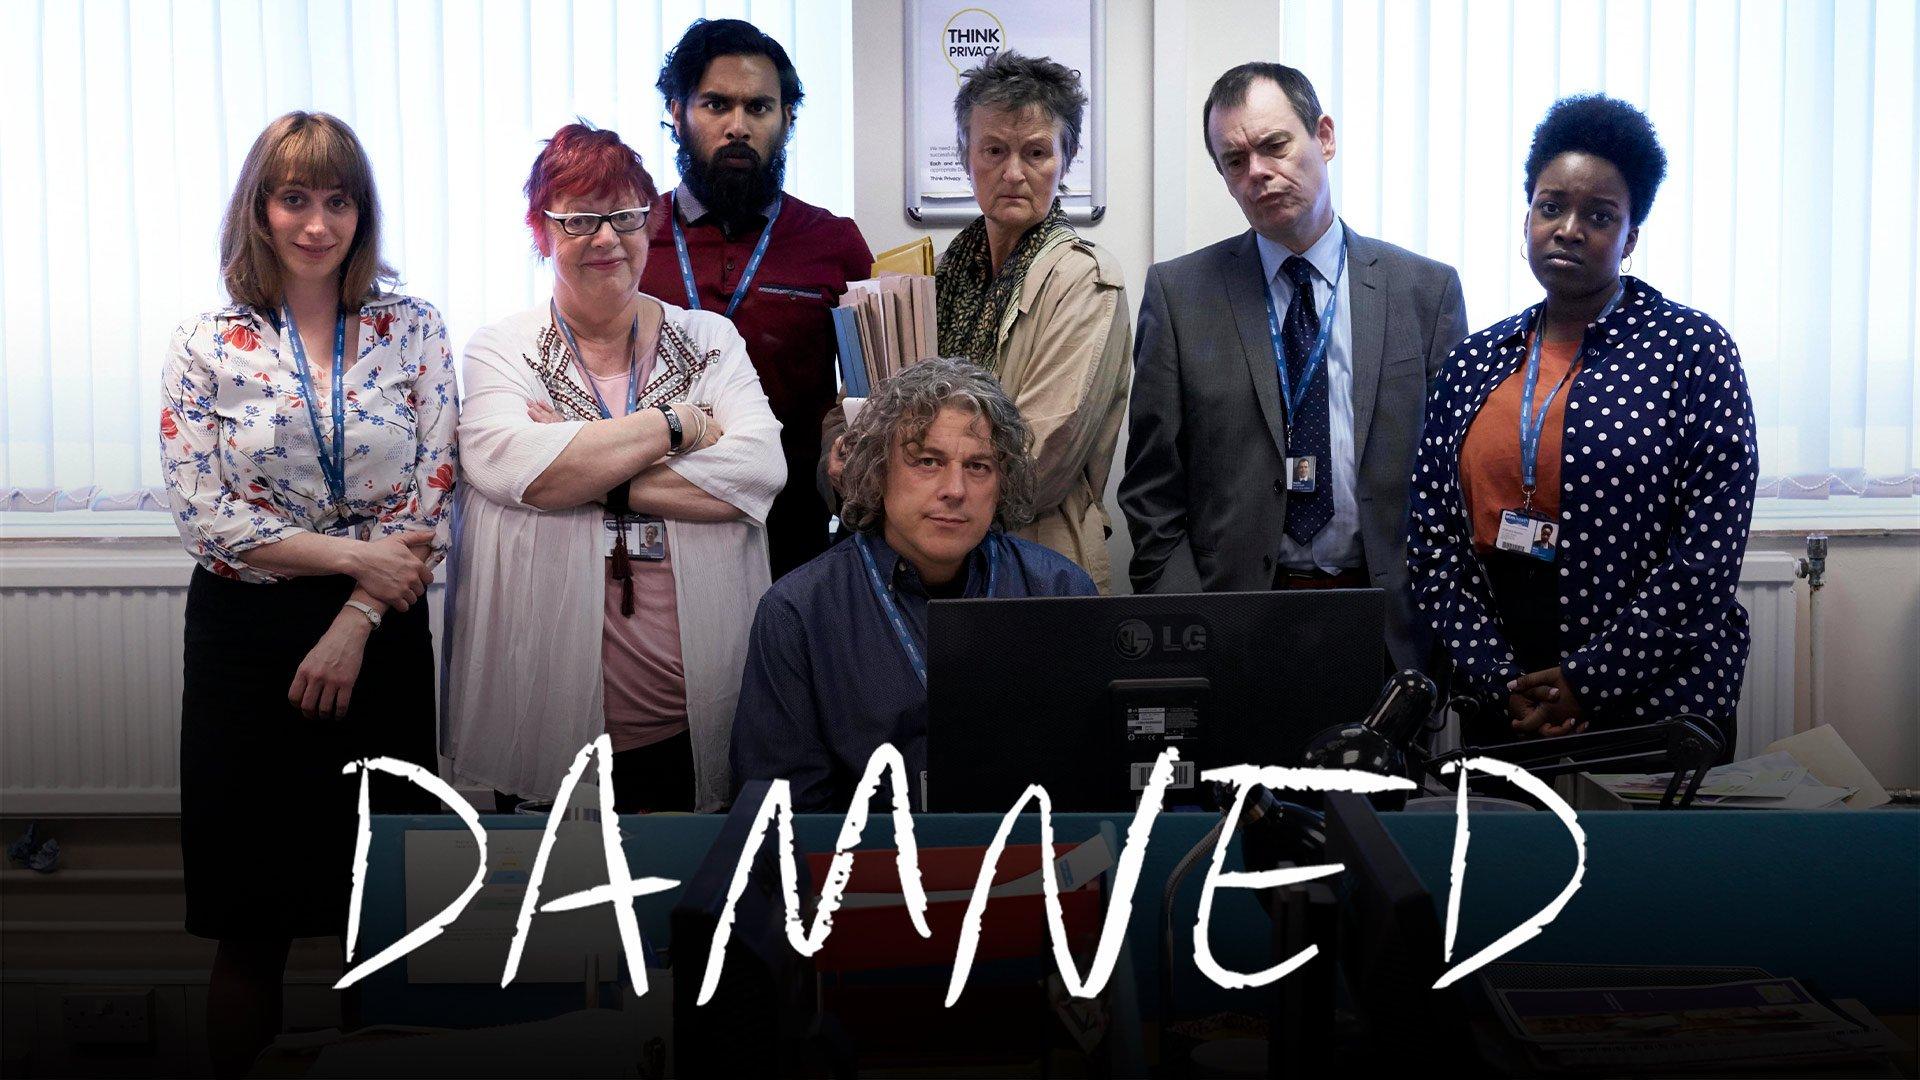 Damned on BritBox UK